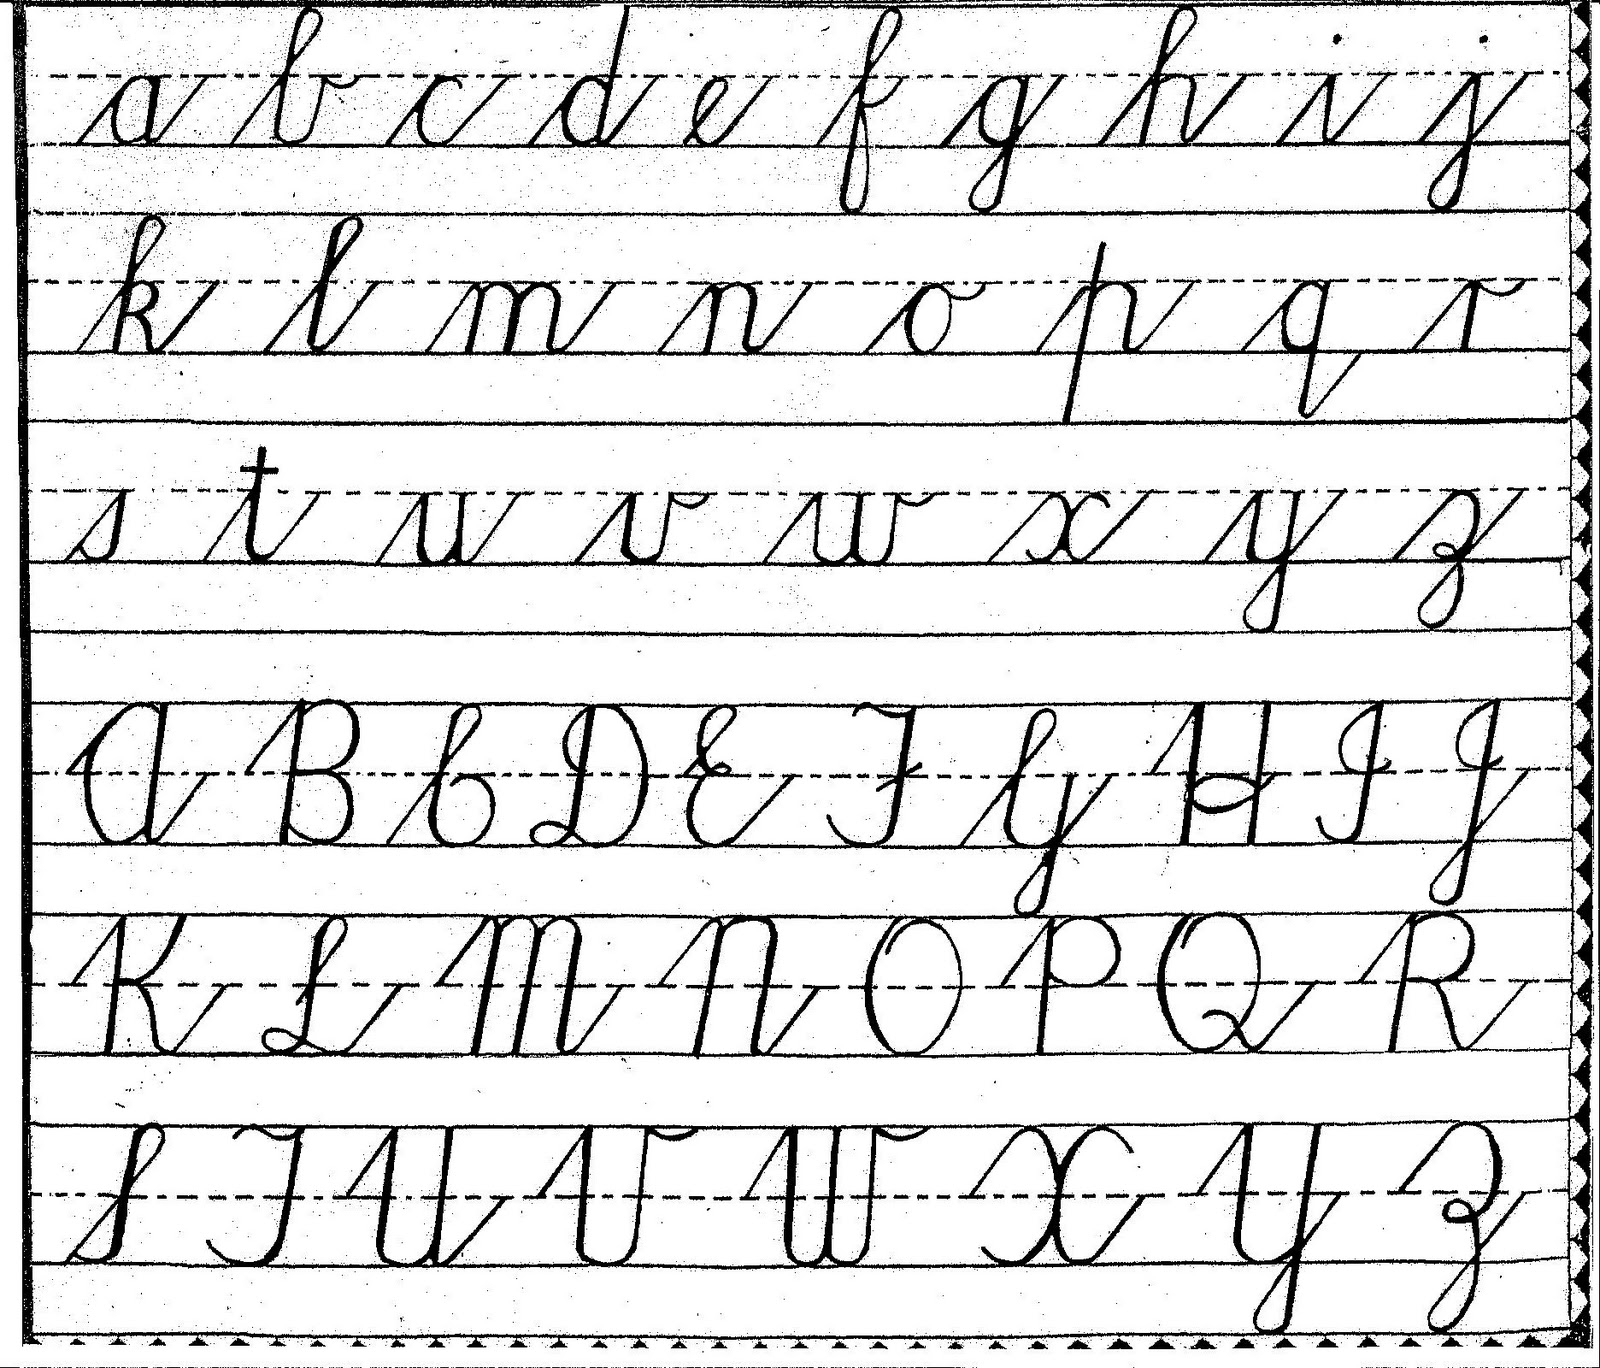 Cursive Writing Kids Activities Handwriting Worksheet Maker inside Alphabet Tracing Maker